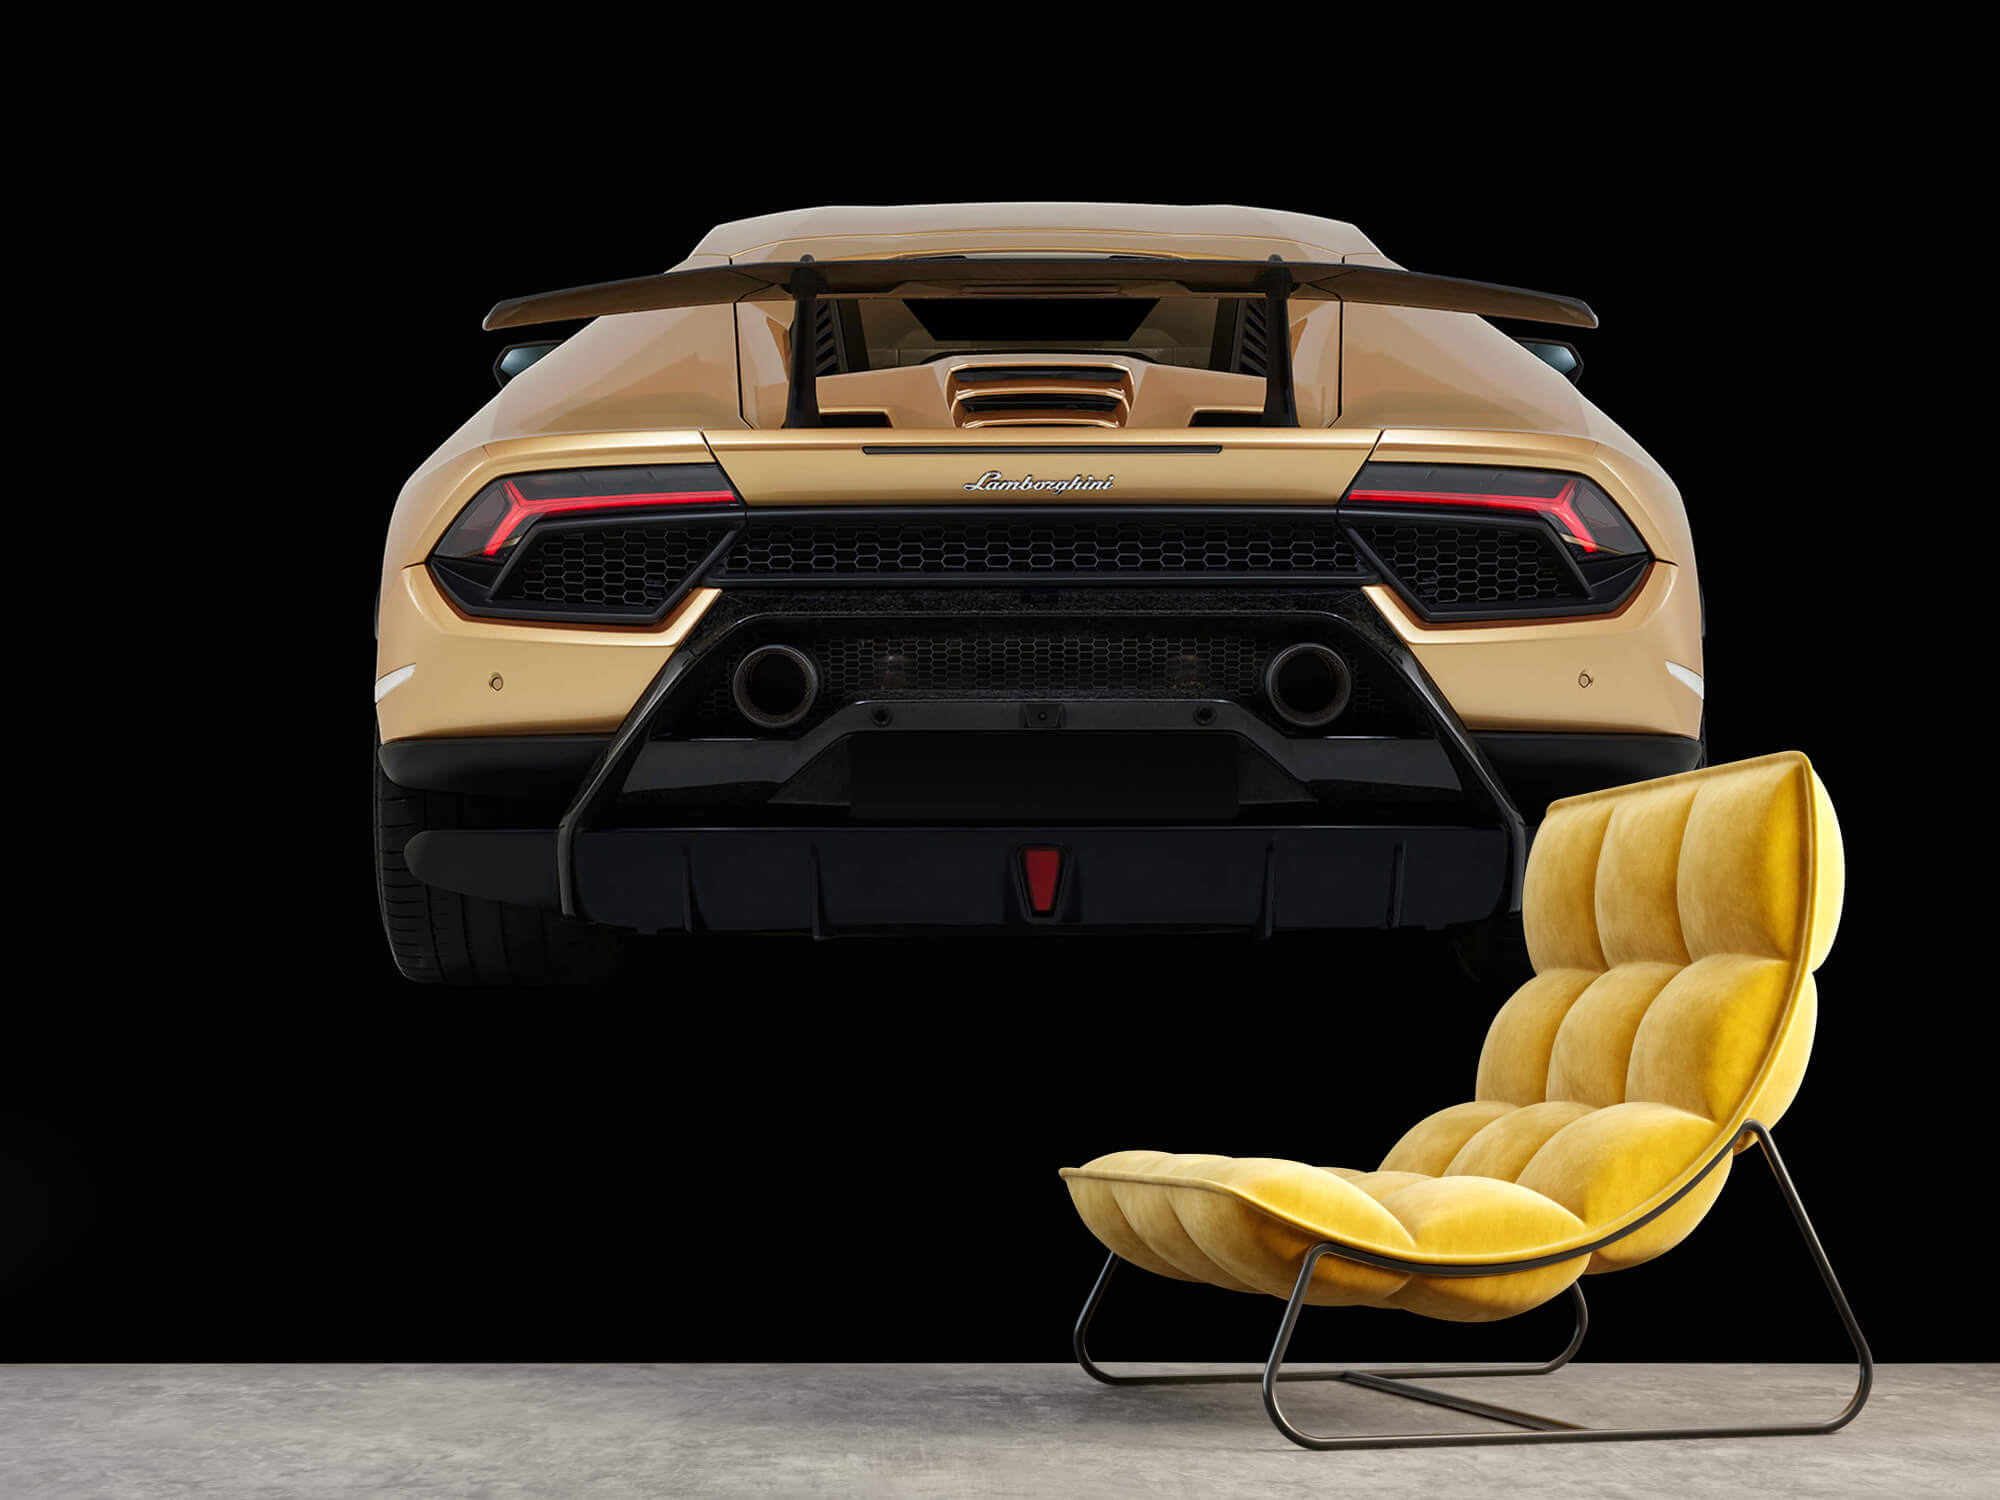 Wallpaper Lamborghini Huracán - Arrière, noir 10